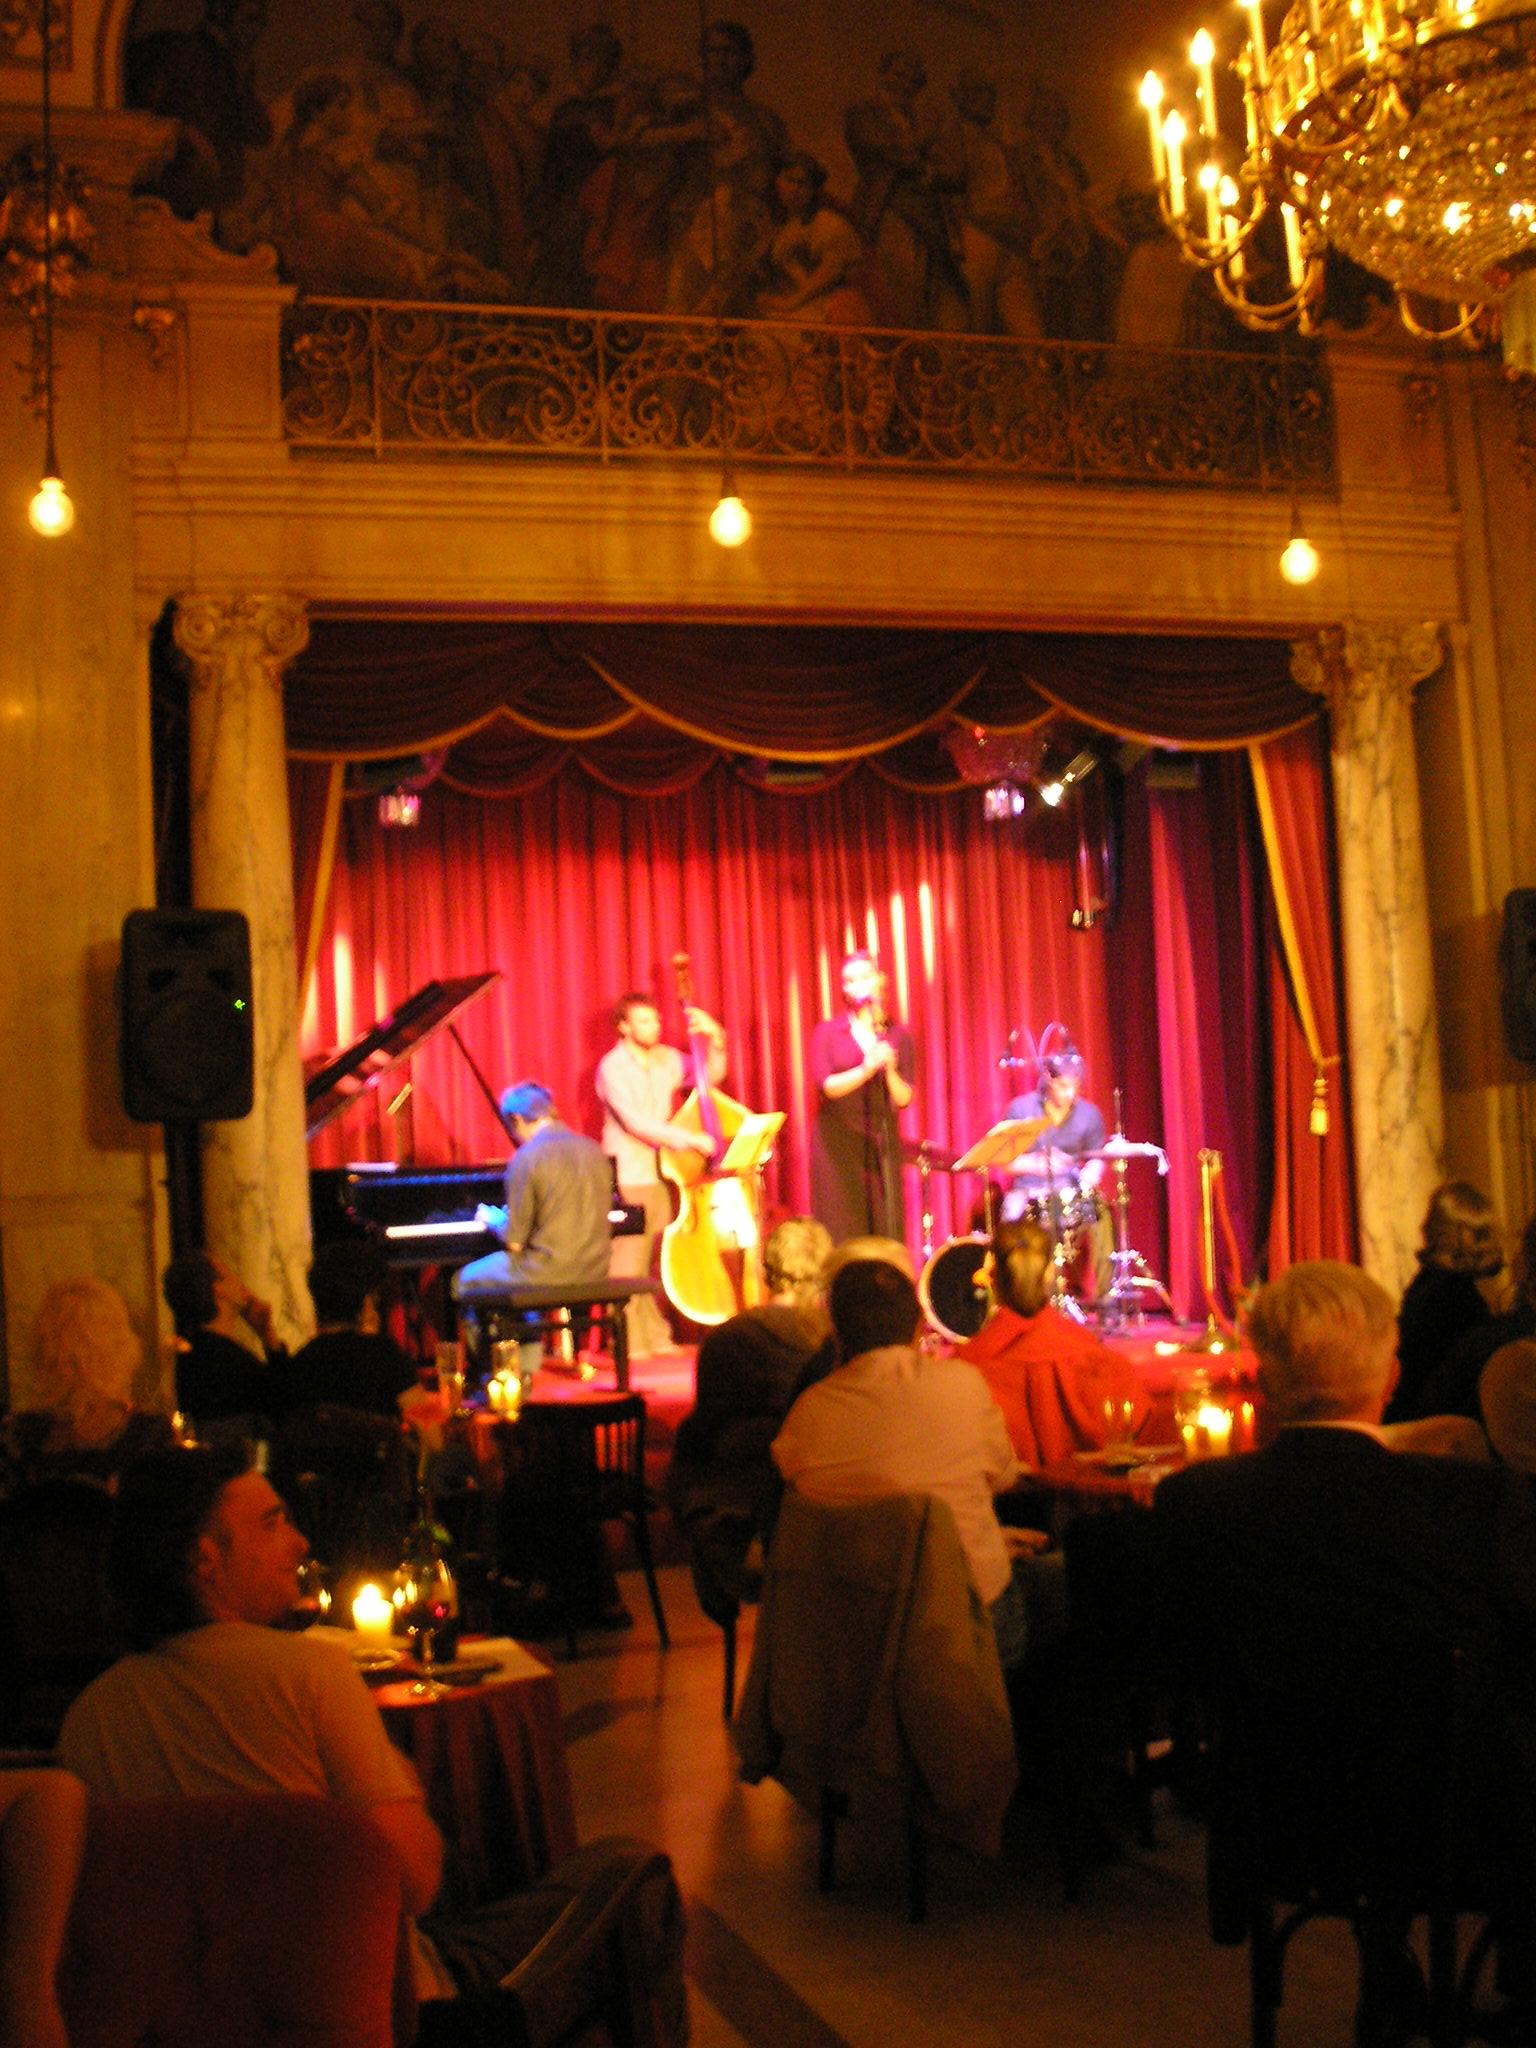 Filevolkstheater Vienna Sept 2006 002jpg Wikimedia Commons